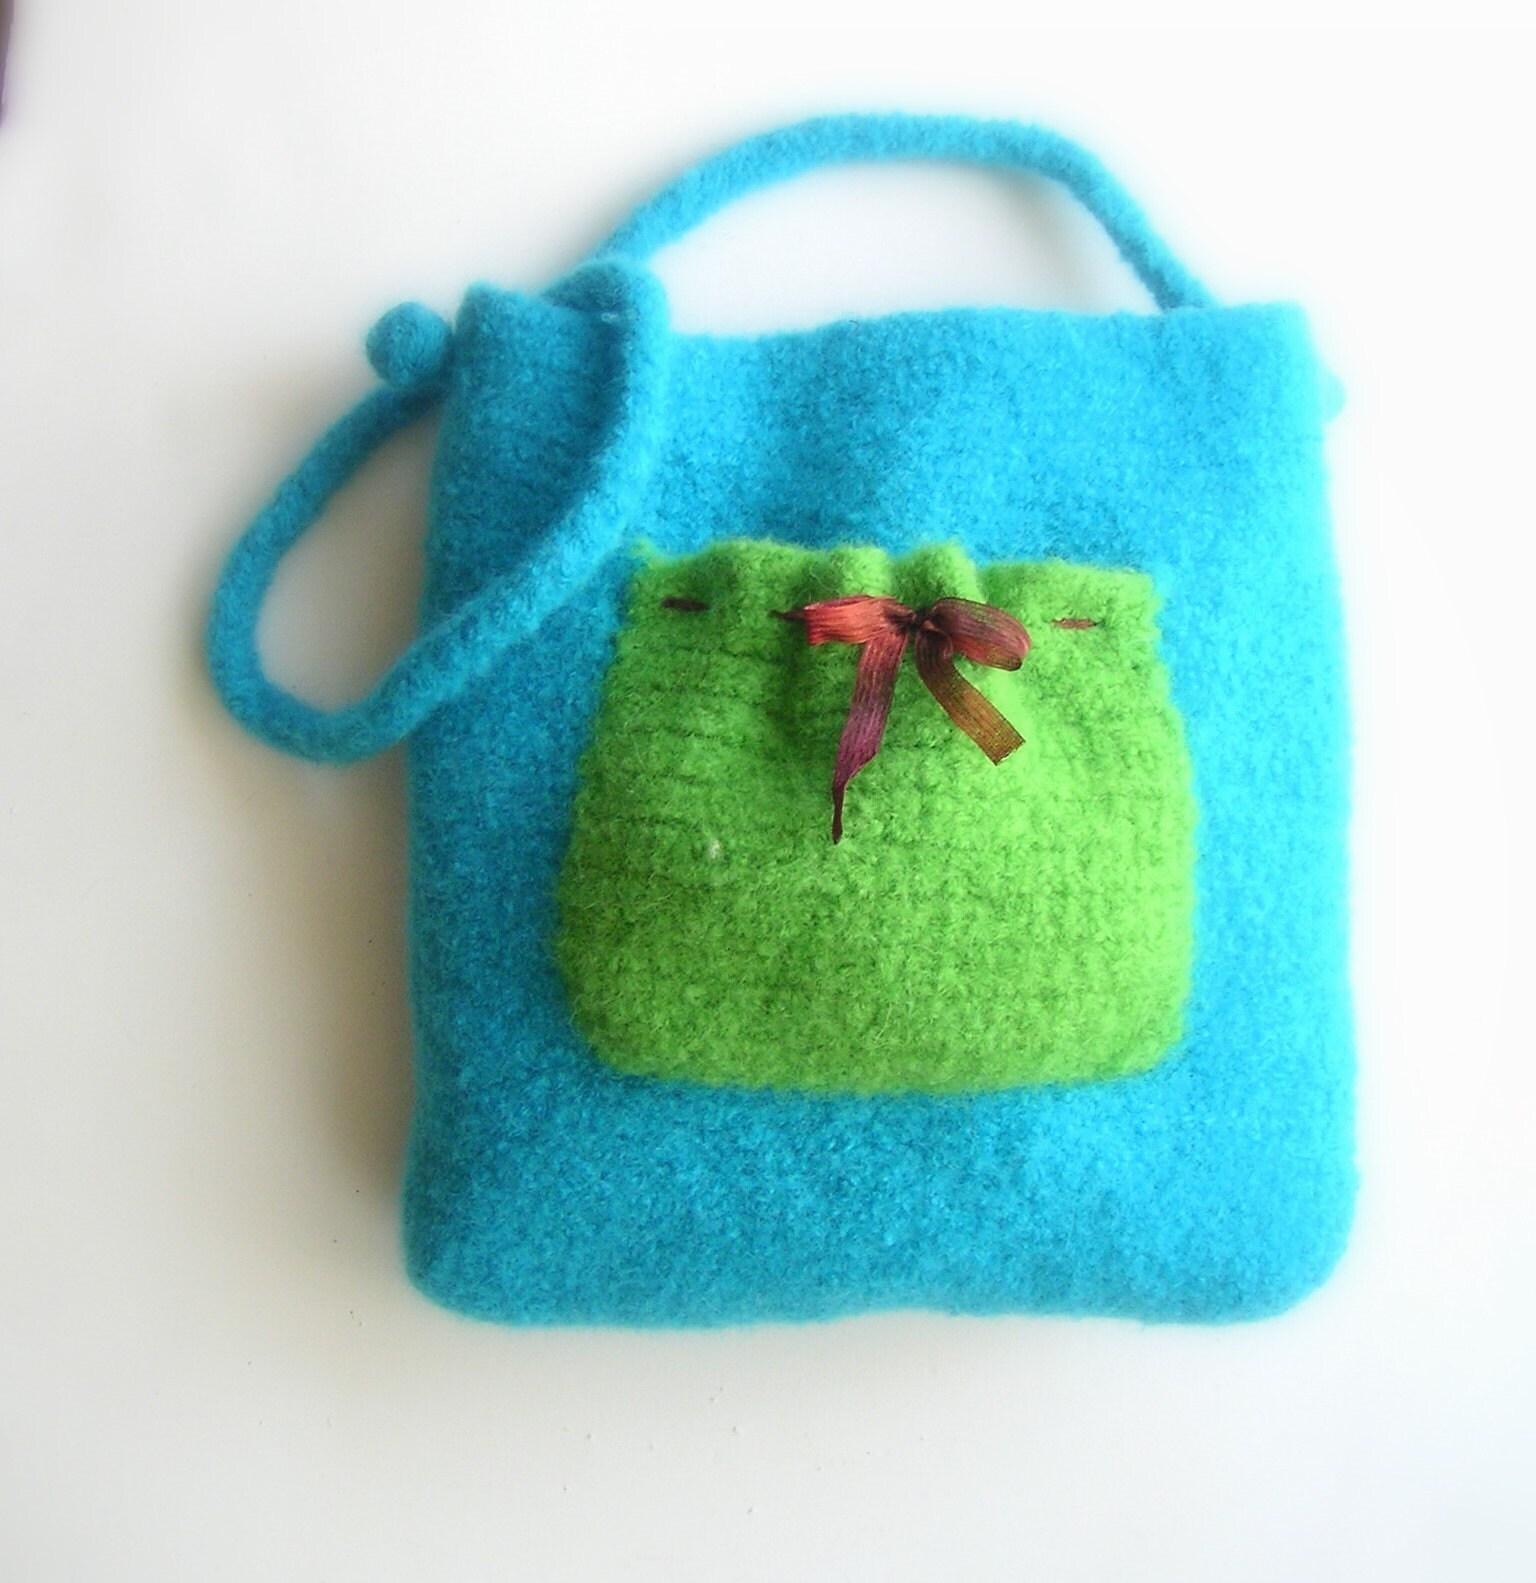 Felted Bag - Yarns, Knitting Patterns, Crochet Patterns